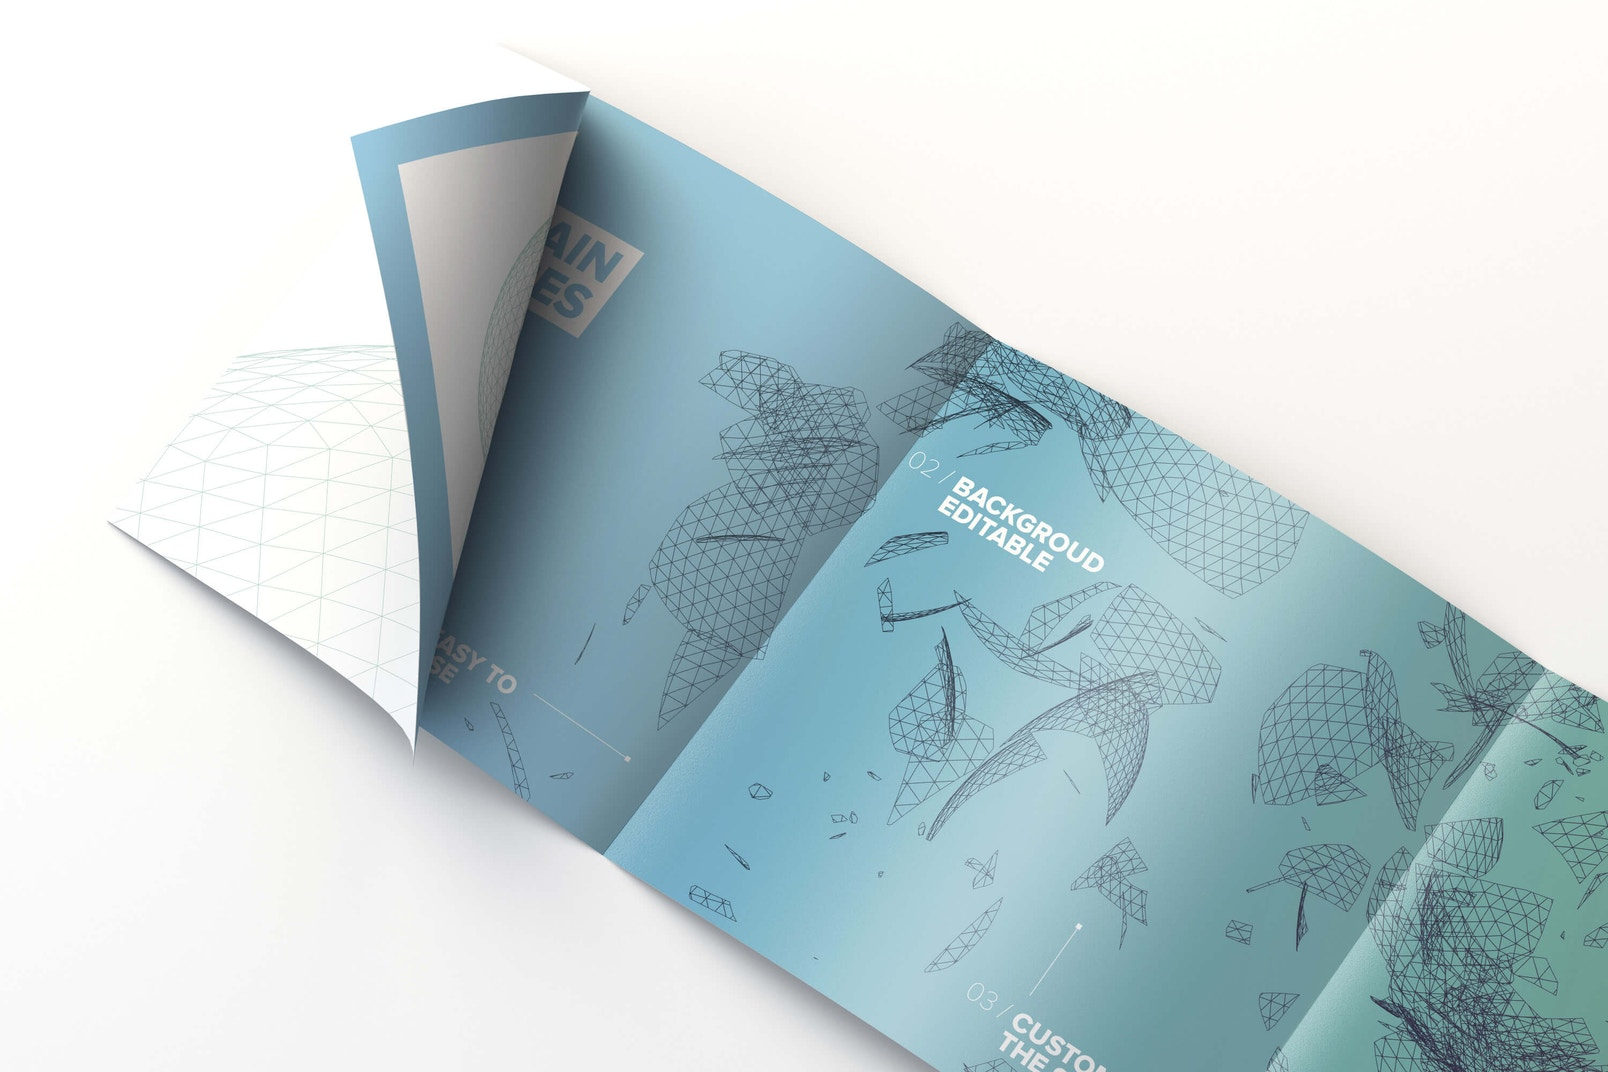 Inside Square 4-Fold Brochure Rolled Page Mockup 01